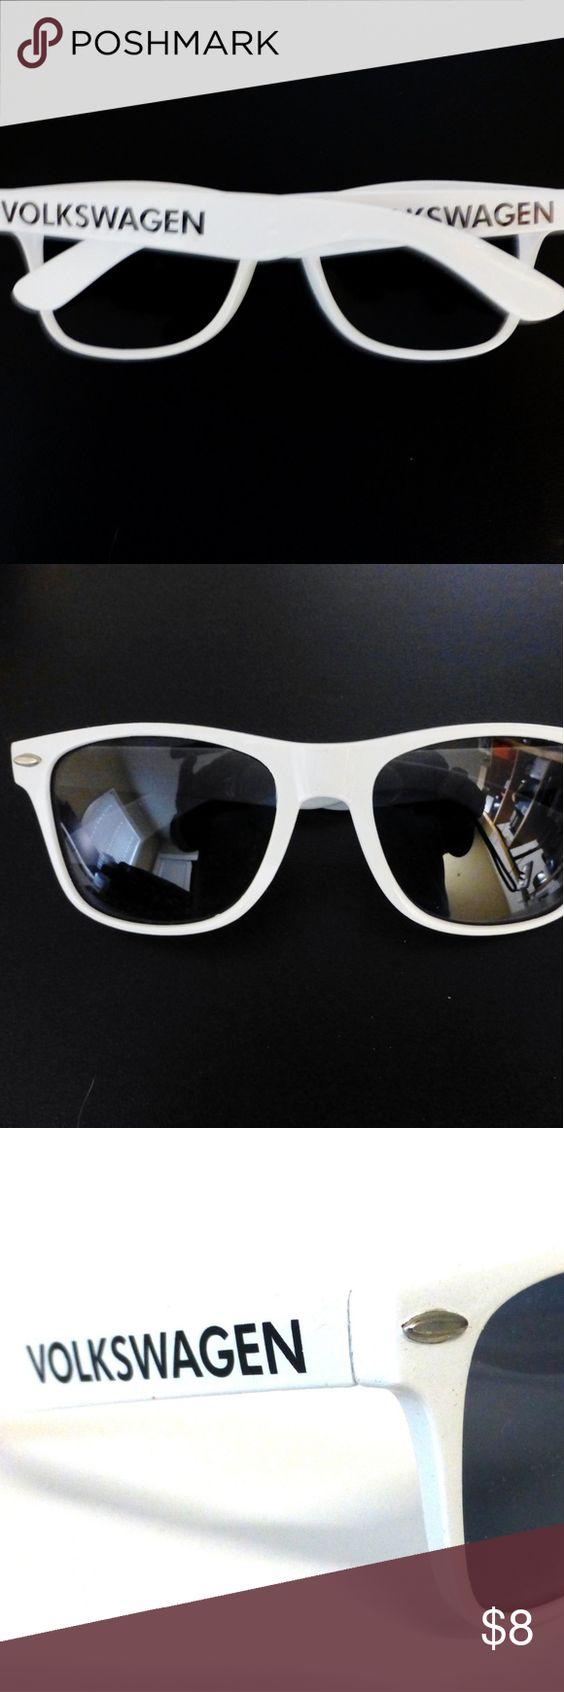 Volkswagen Wayfarer style promo sunglasses New Unisex style White plastic frame with gray lenses Volkswagen Accessories Sunglasses